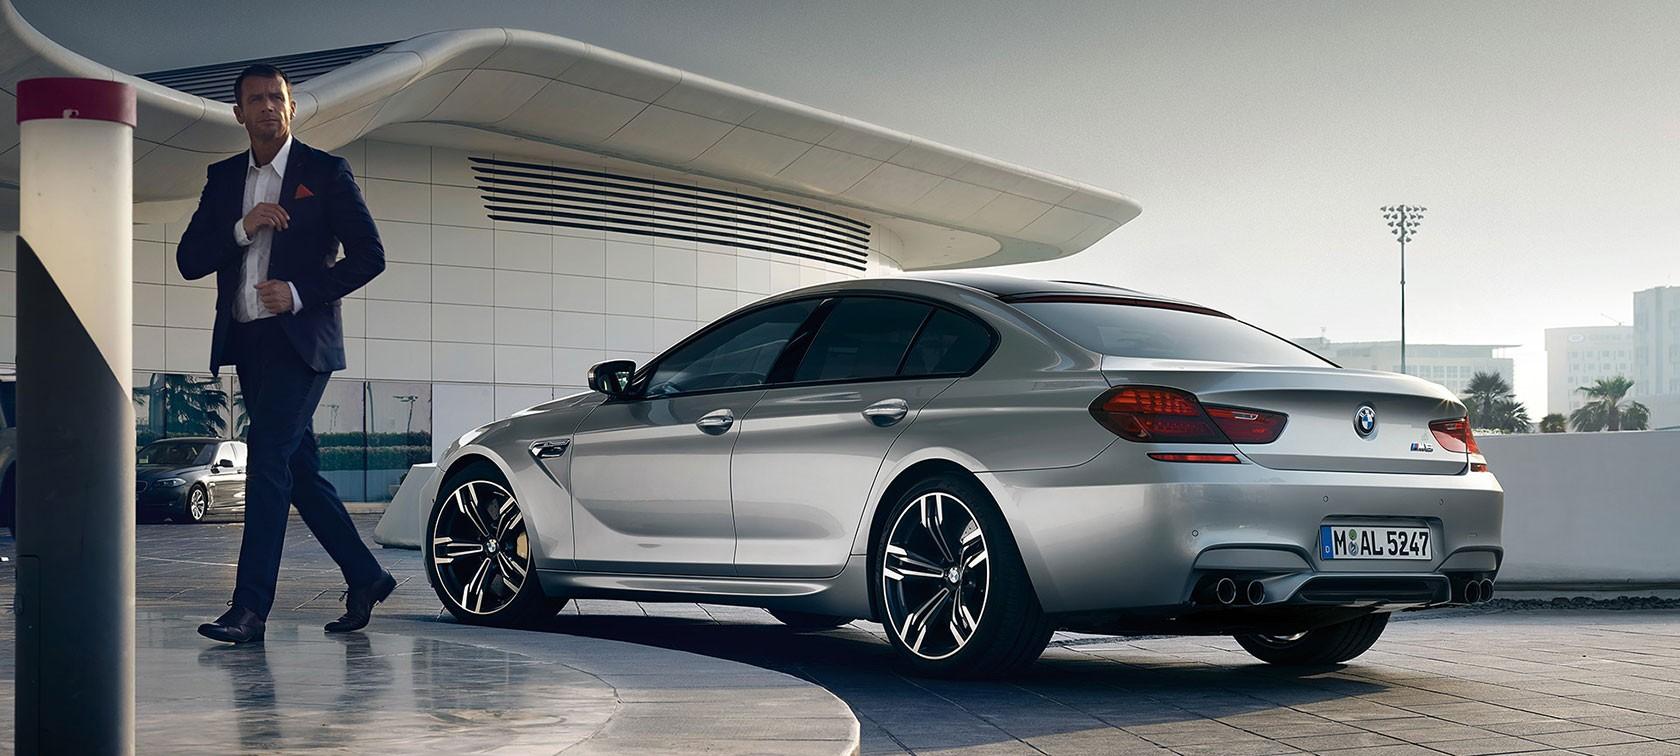 Photo of Καμπάνα στην BMW Αυστραλίας… για υπέρμετρο δανεισμό!